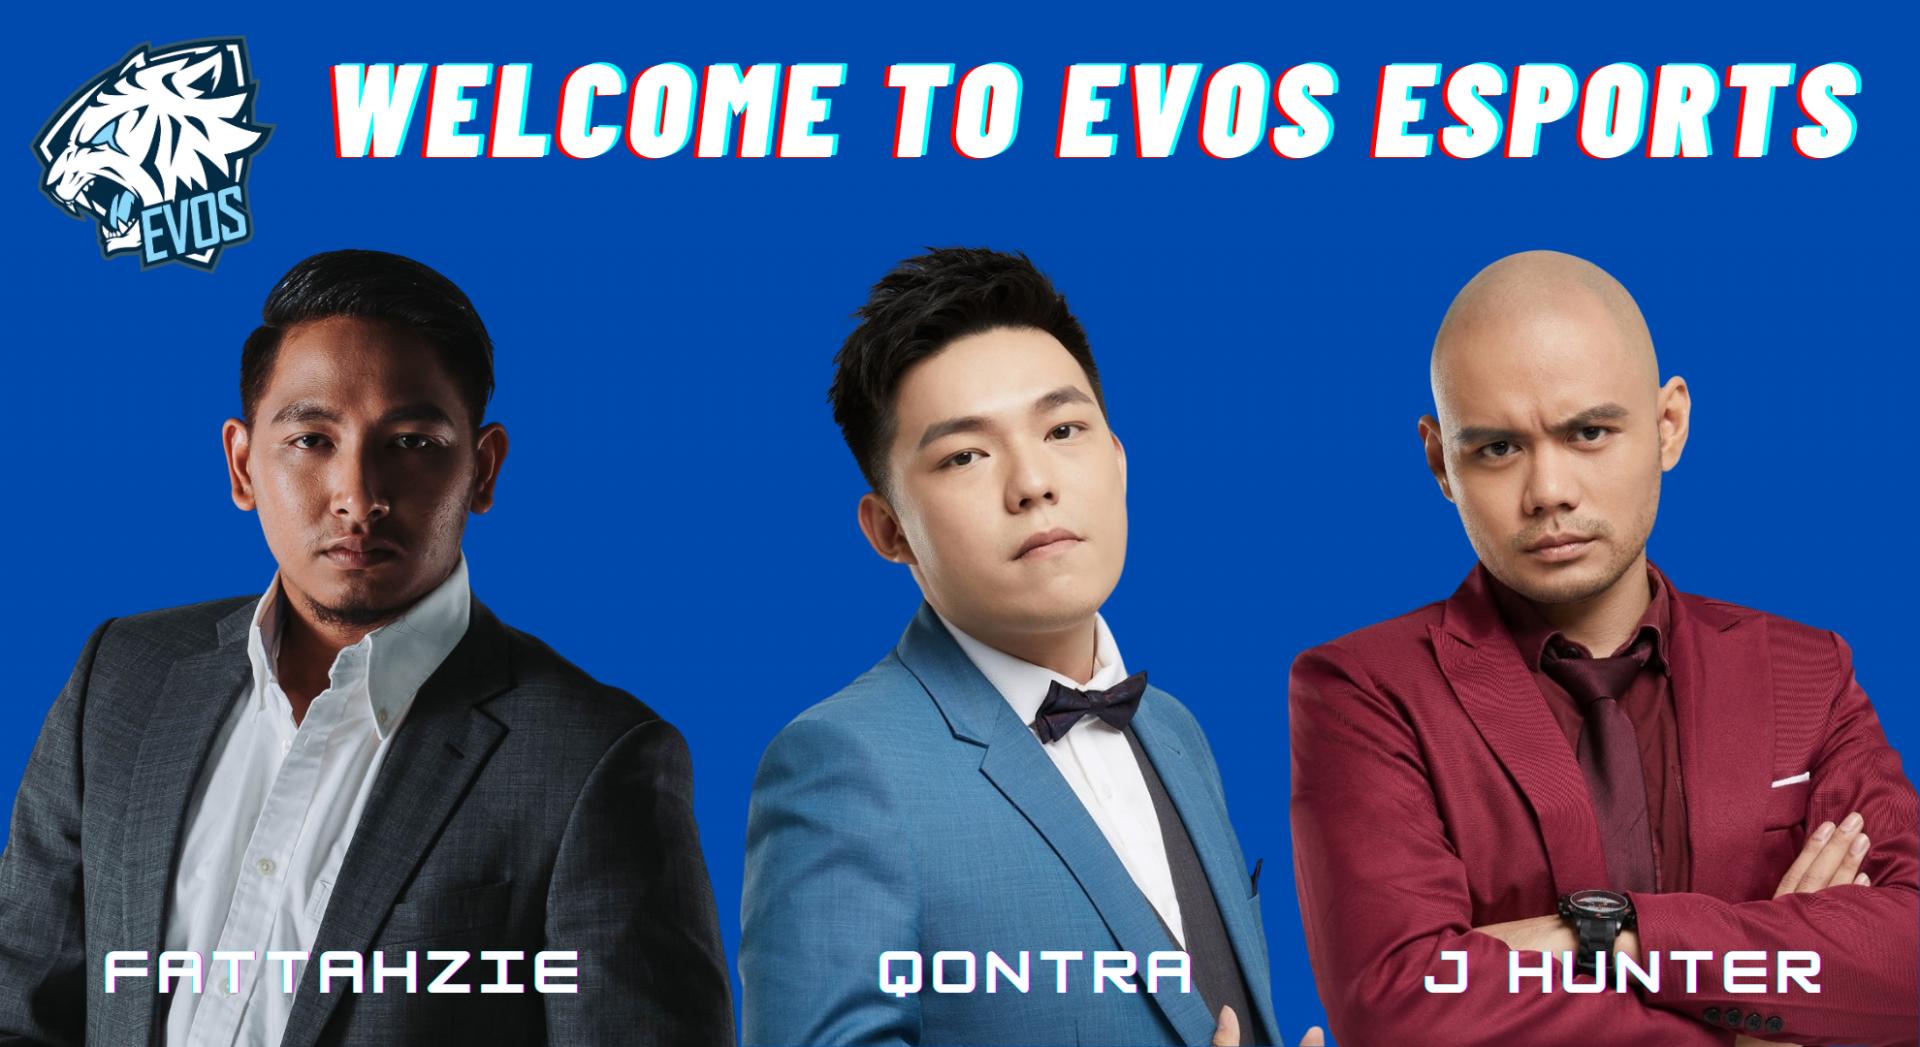 EVOS Esports x Aaron Qontra Chan